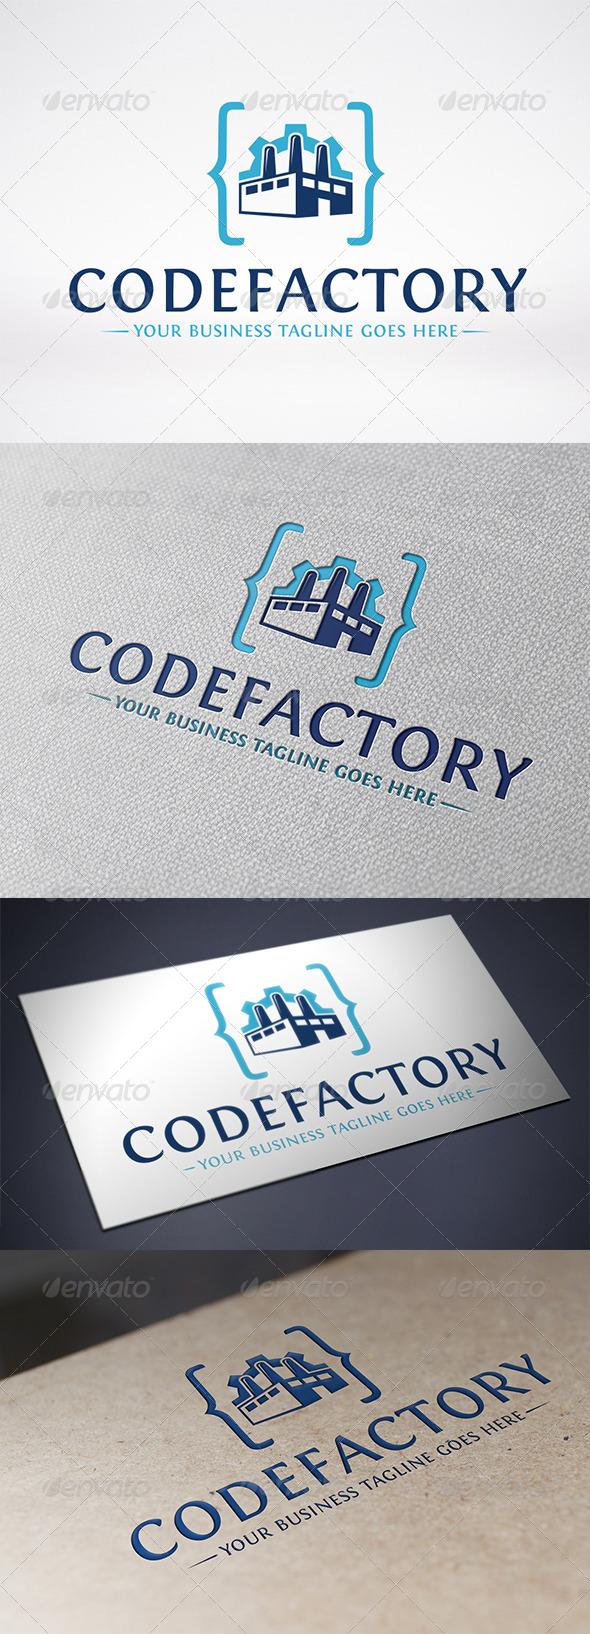 Code Factory Logo Template - Buildings Logo Templates